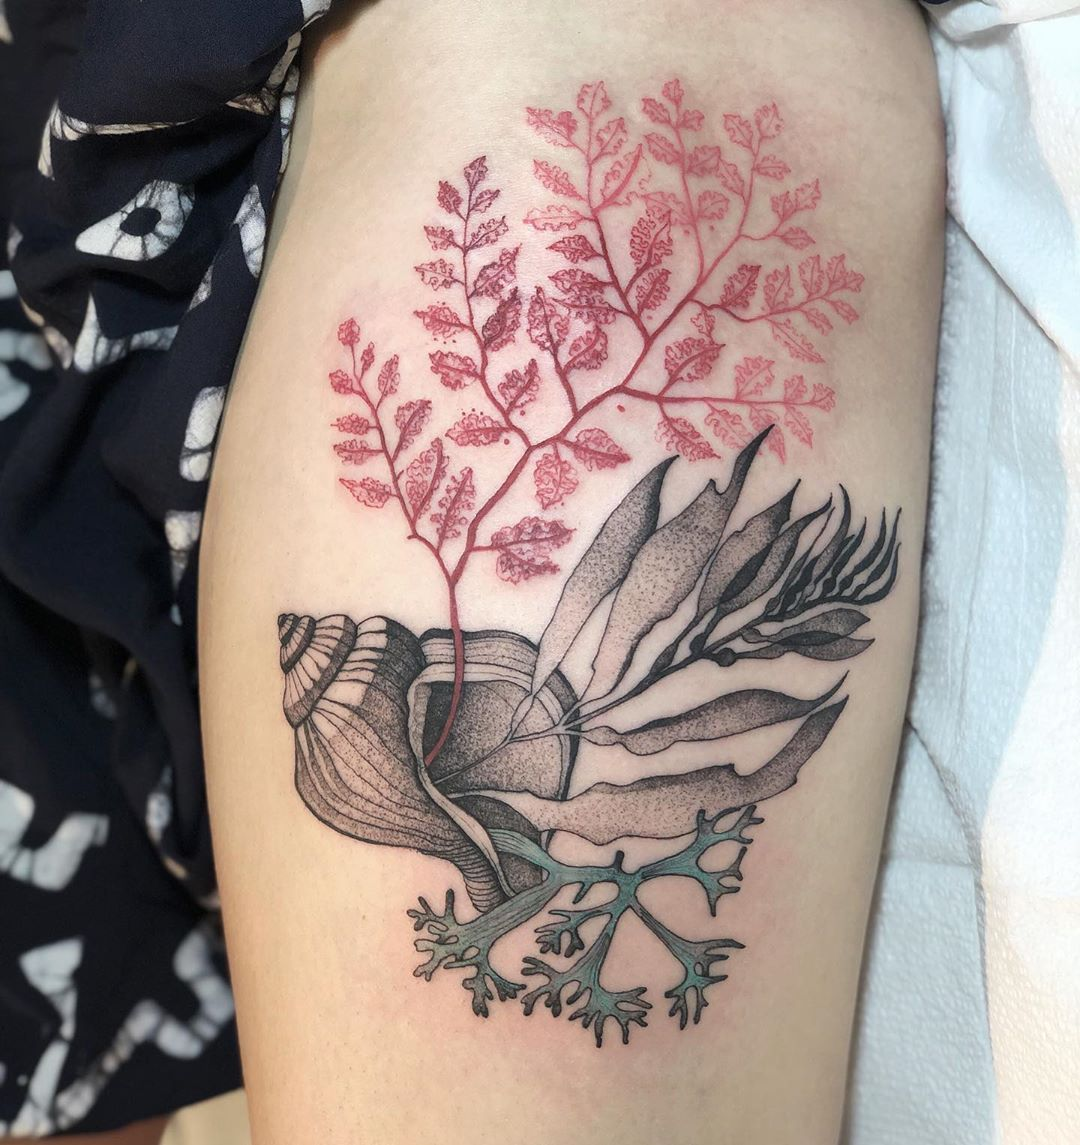 "Tattooer, Wroclaw, Poland on Instagram: ""Seaweed&shell 💚  #seaweed #plants #shell #ocean #life  #ink #illustration #graphic #dzolama #studiotattoo"""